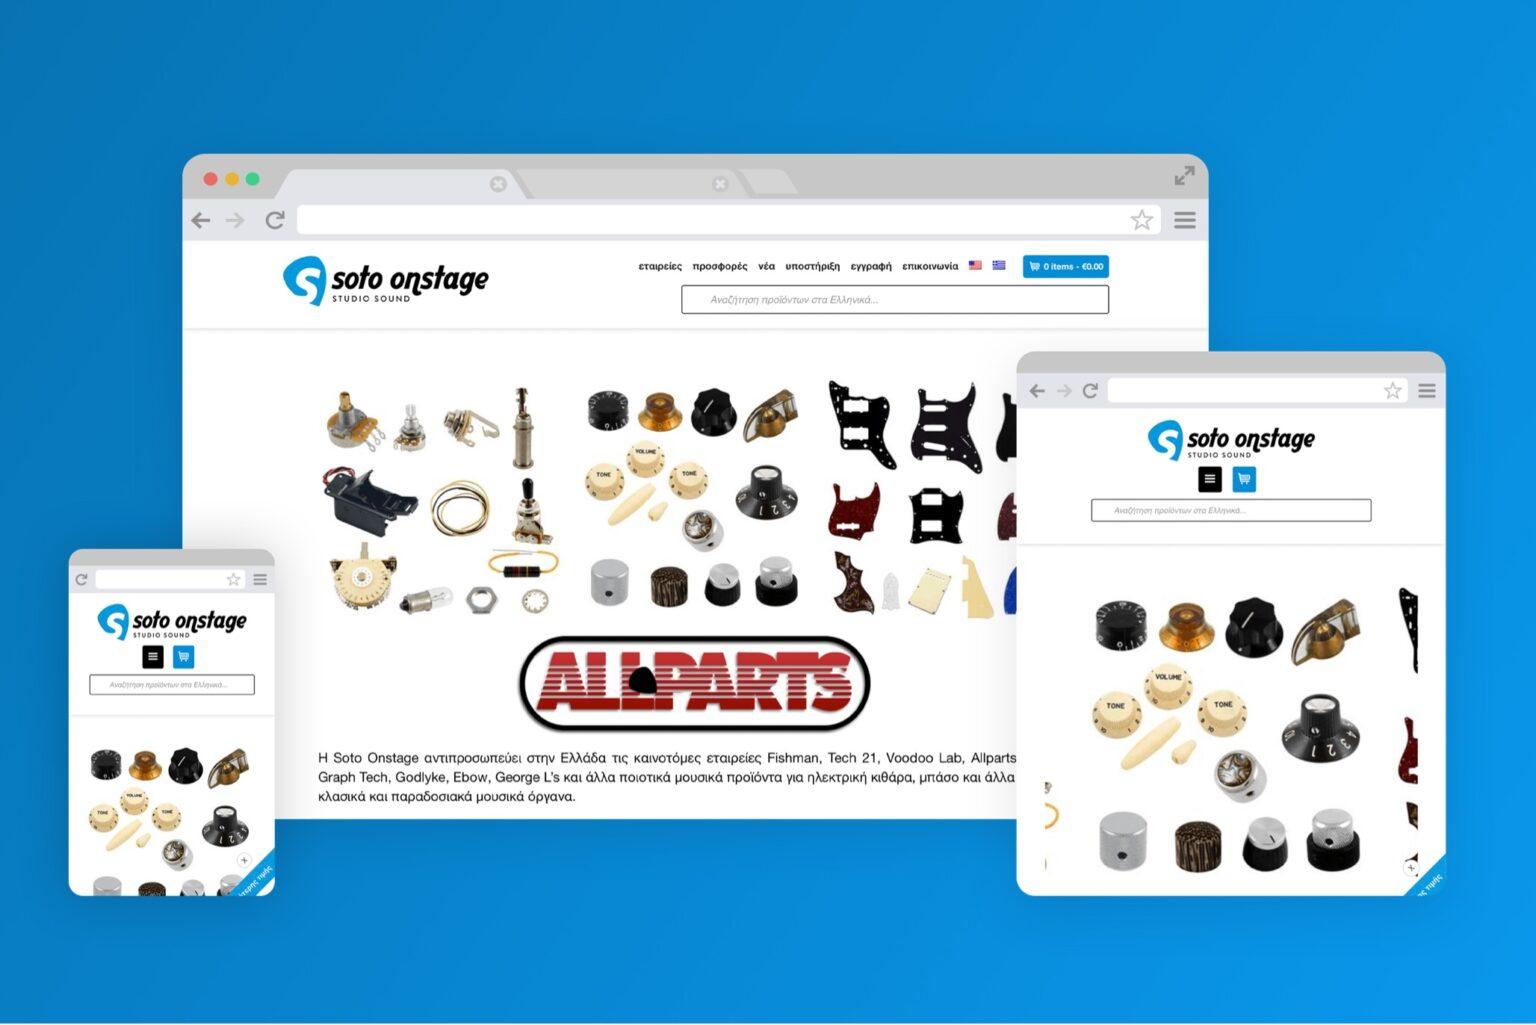 sonstage.gr website screenshot - codeheaven studios portfolio